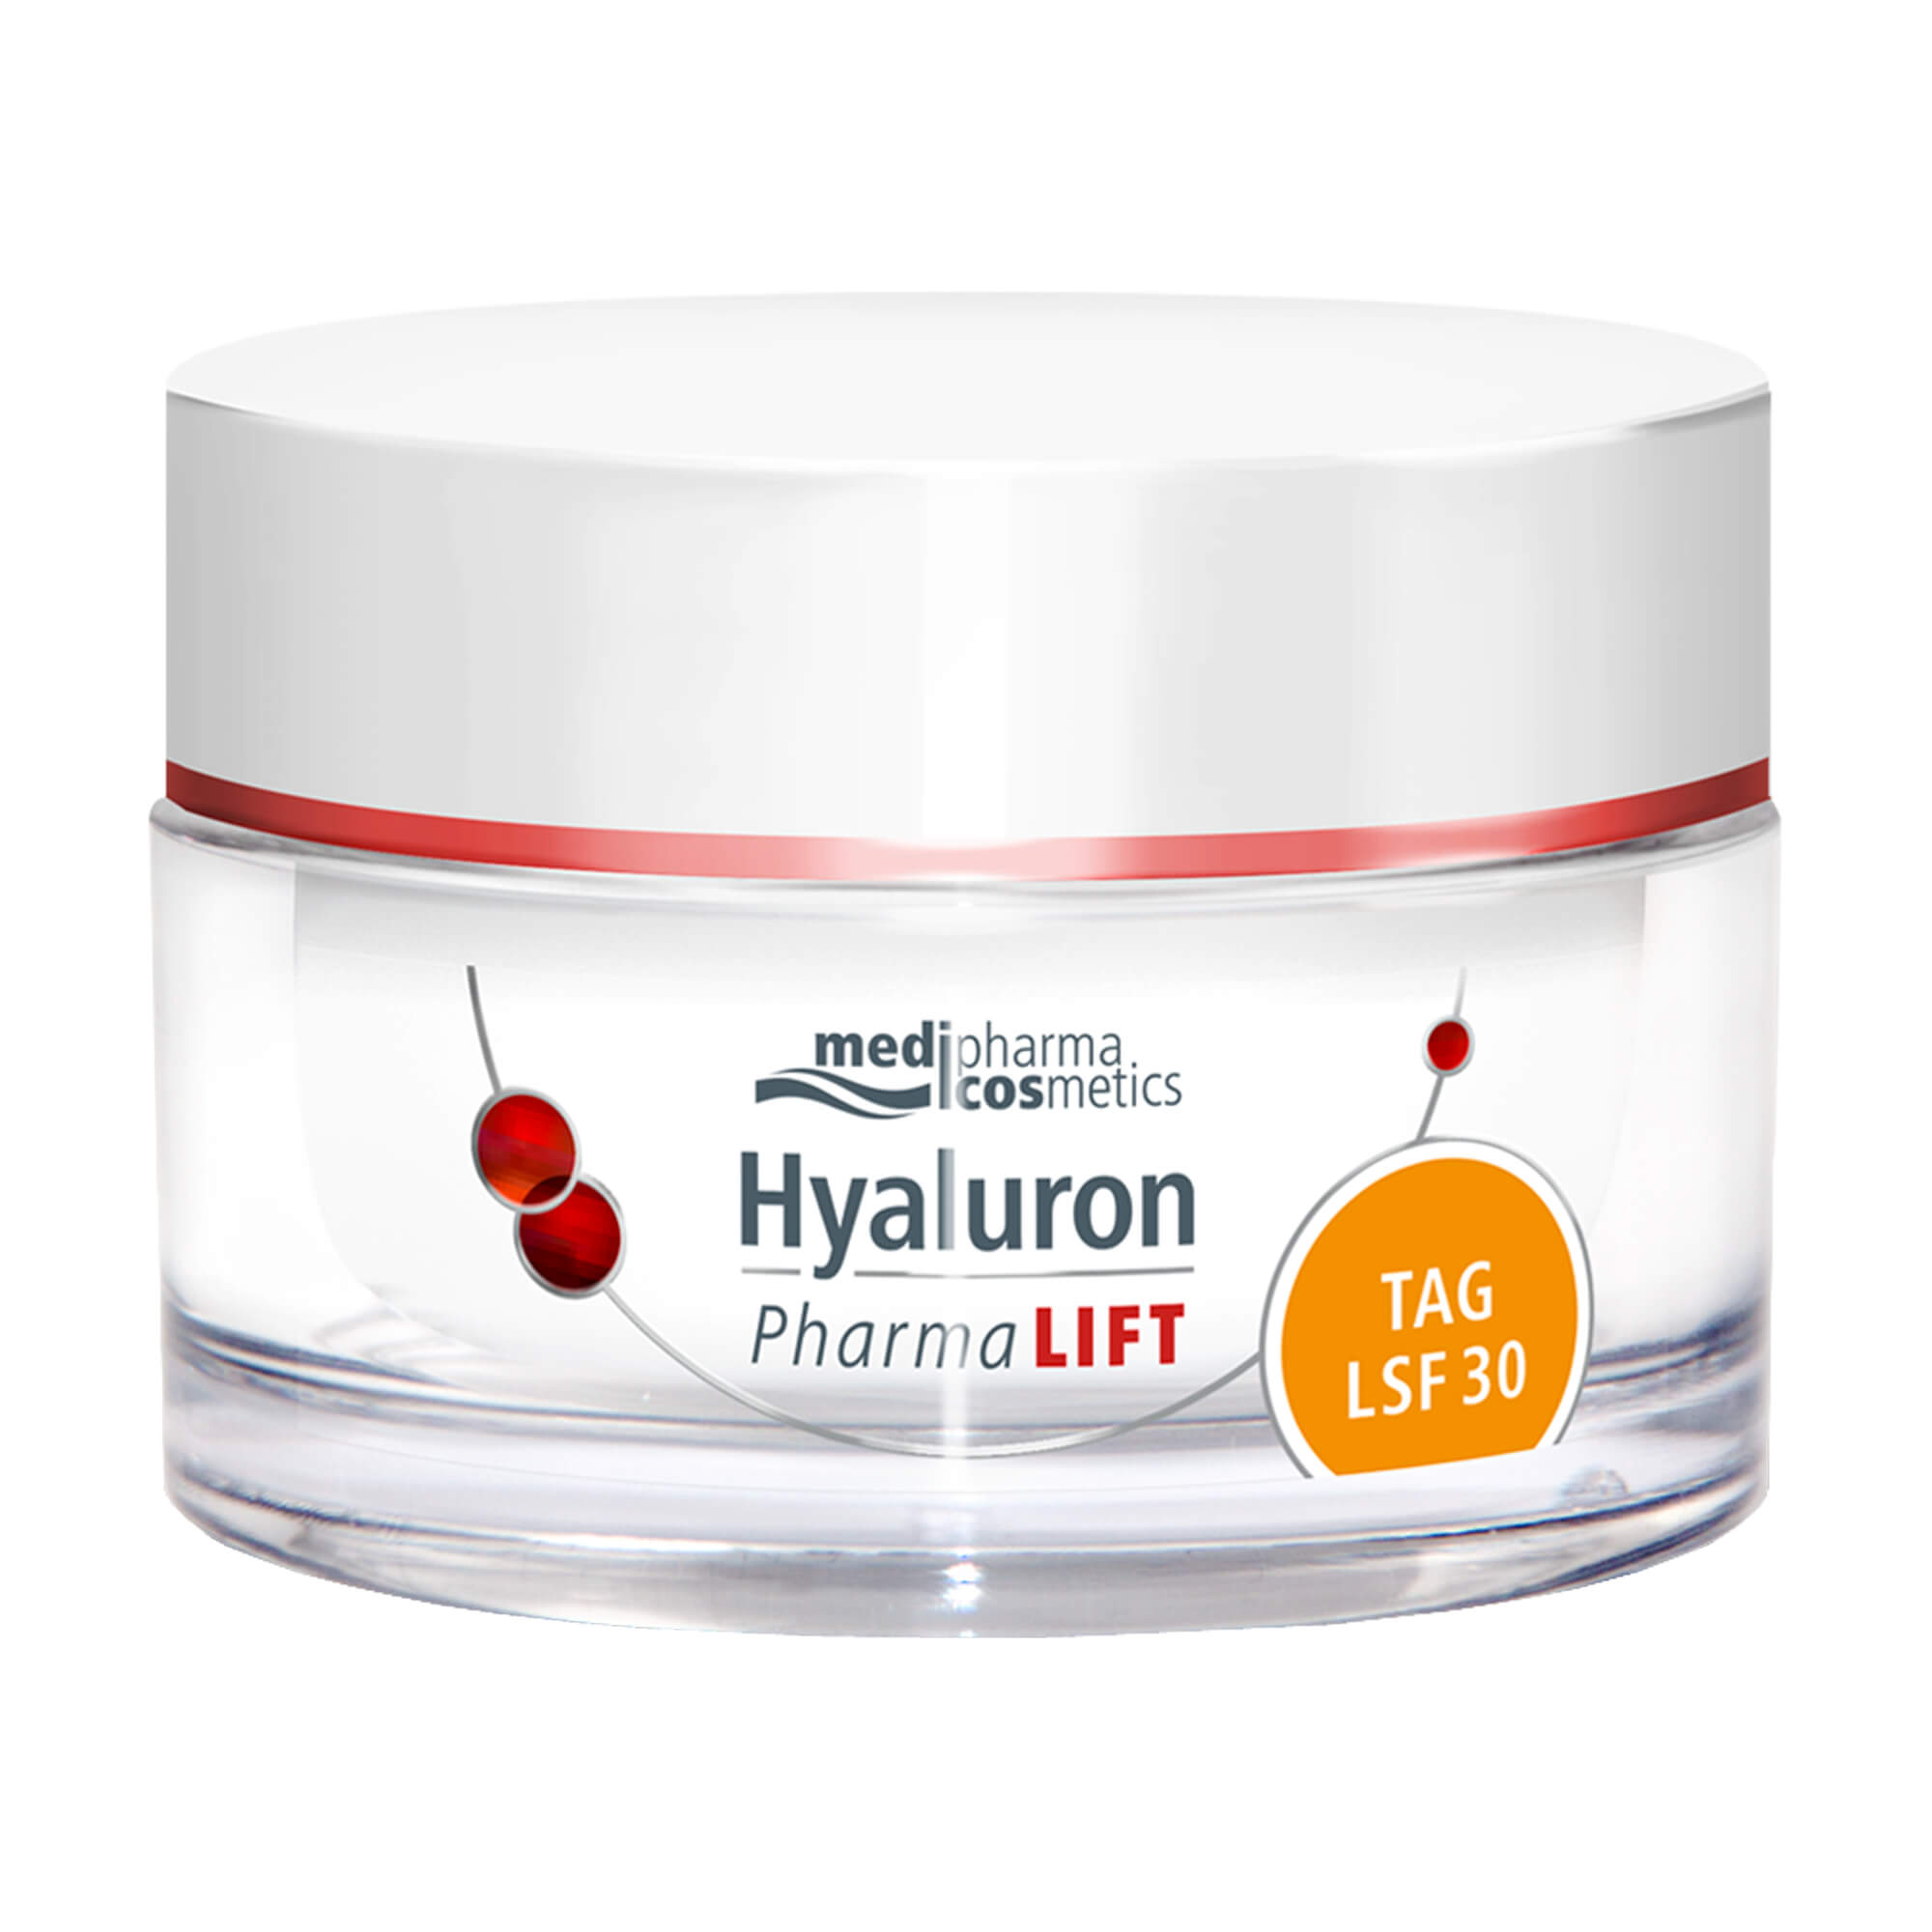 Hyaluron PharmaLIFT Tag Creme LSF 30